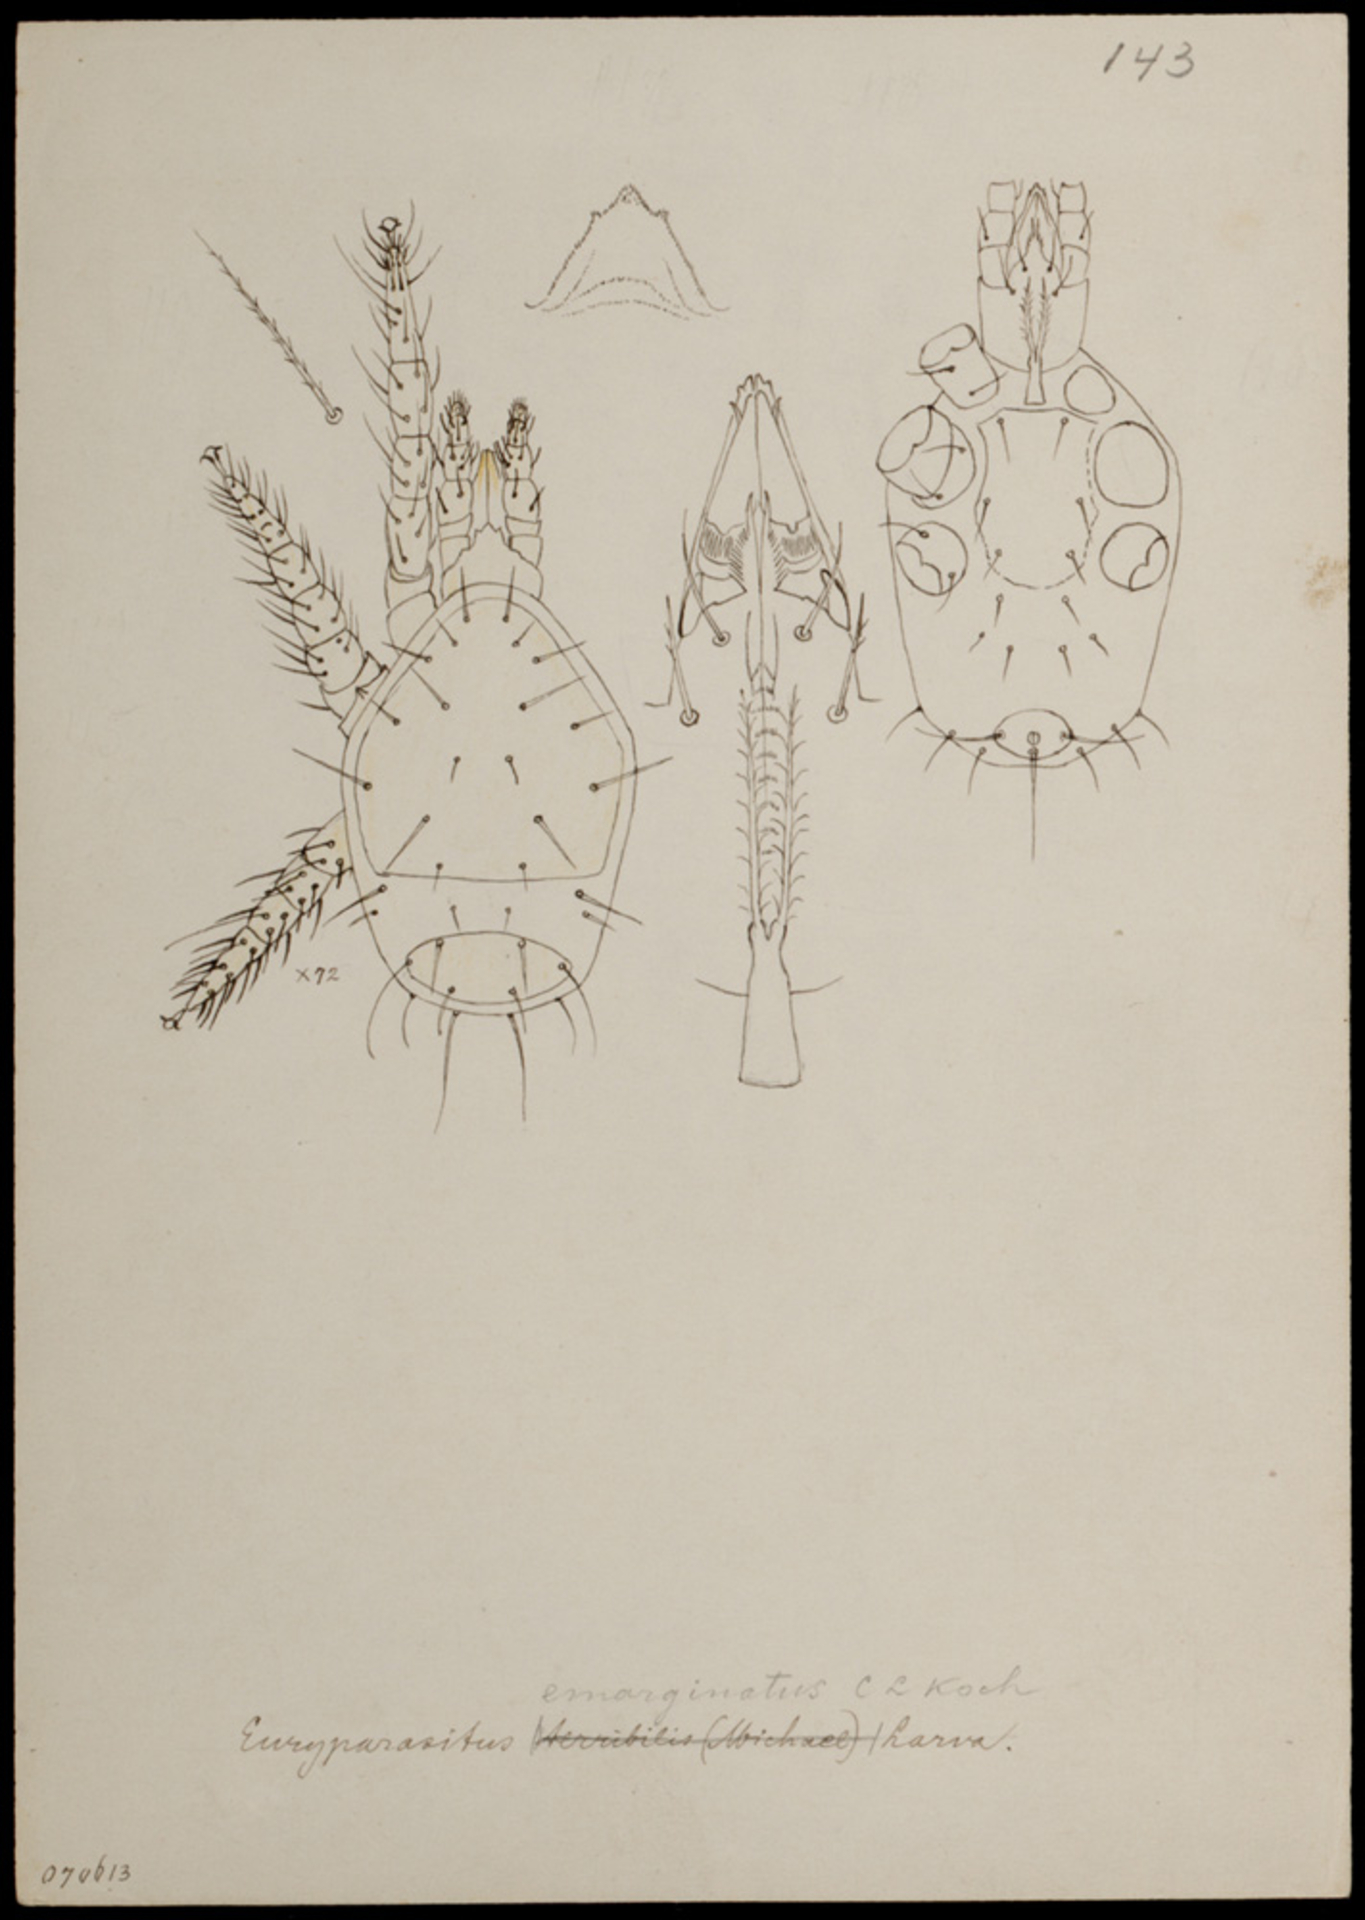 RMNH.ART.1011 | Euryparasitus emarginatus (C. L. Koch)